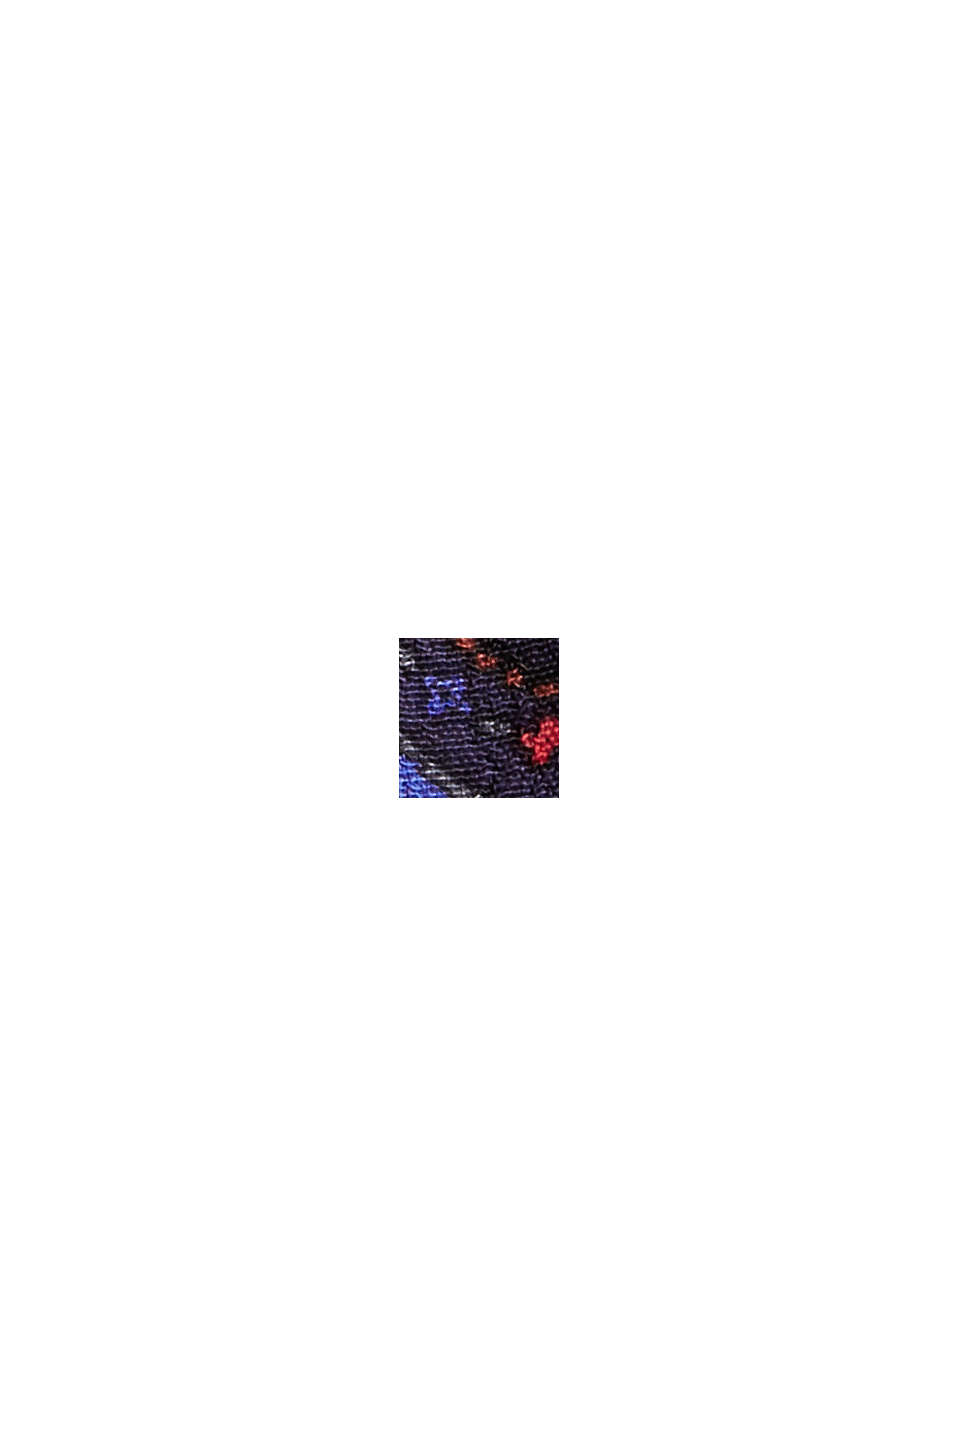 Smok-Bluse mit Paisley-Print, LENZING™ ECOVERO™, NAVY, swatch